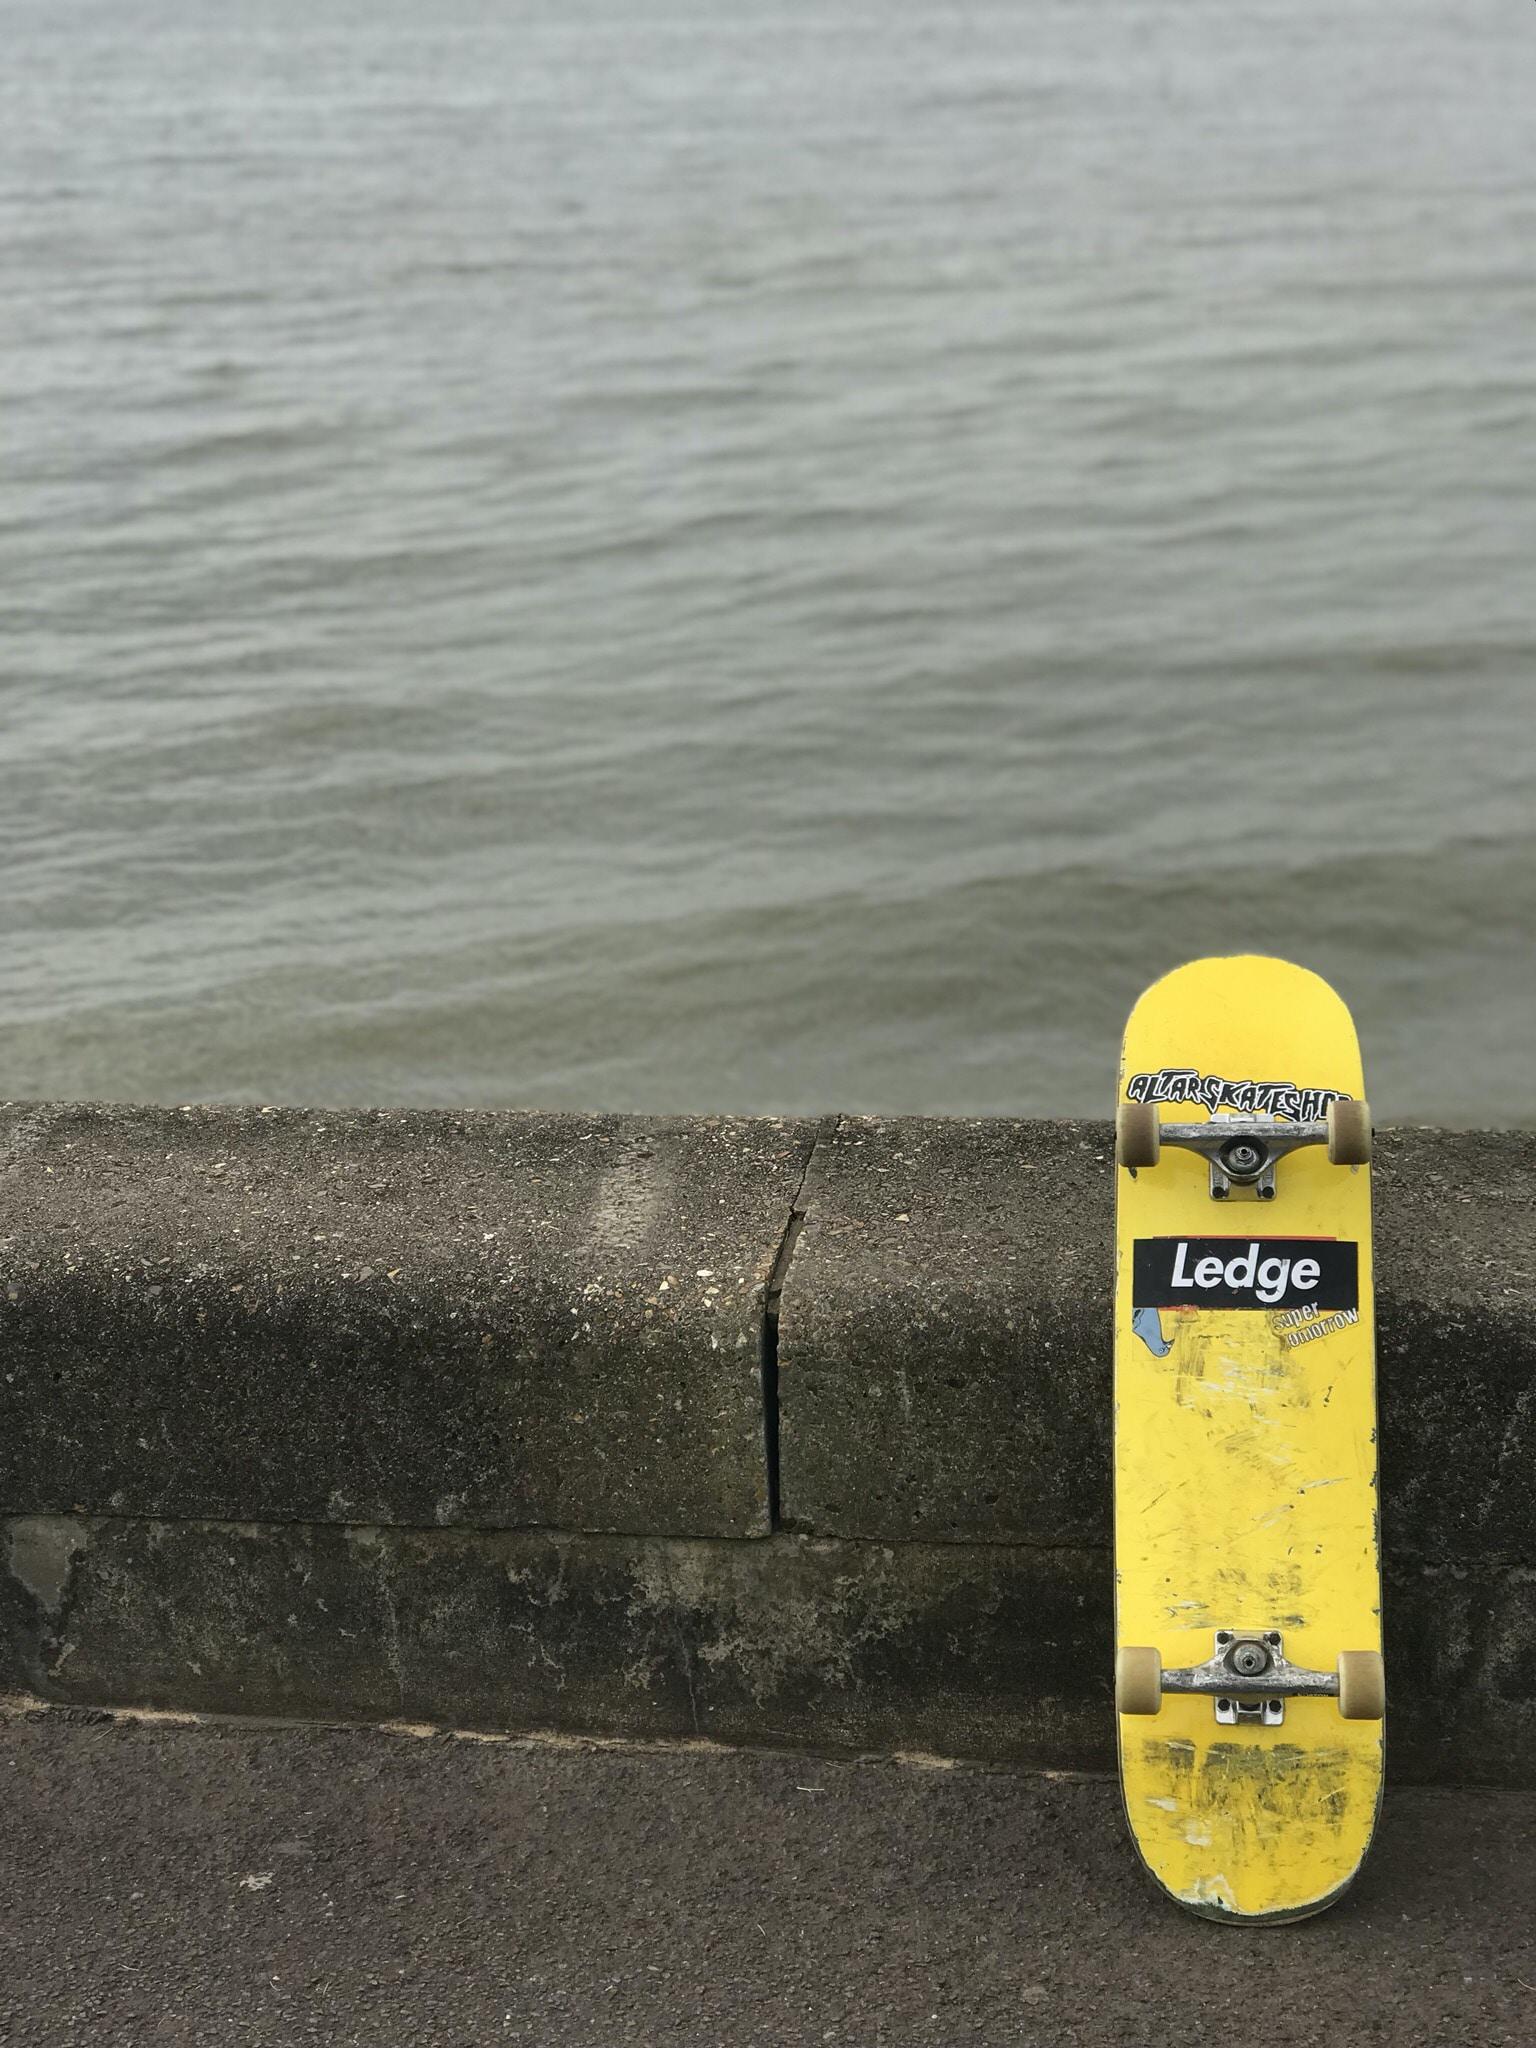 yellow Ledge skateboard near body of water